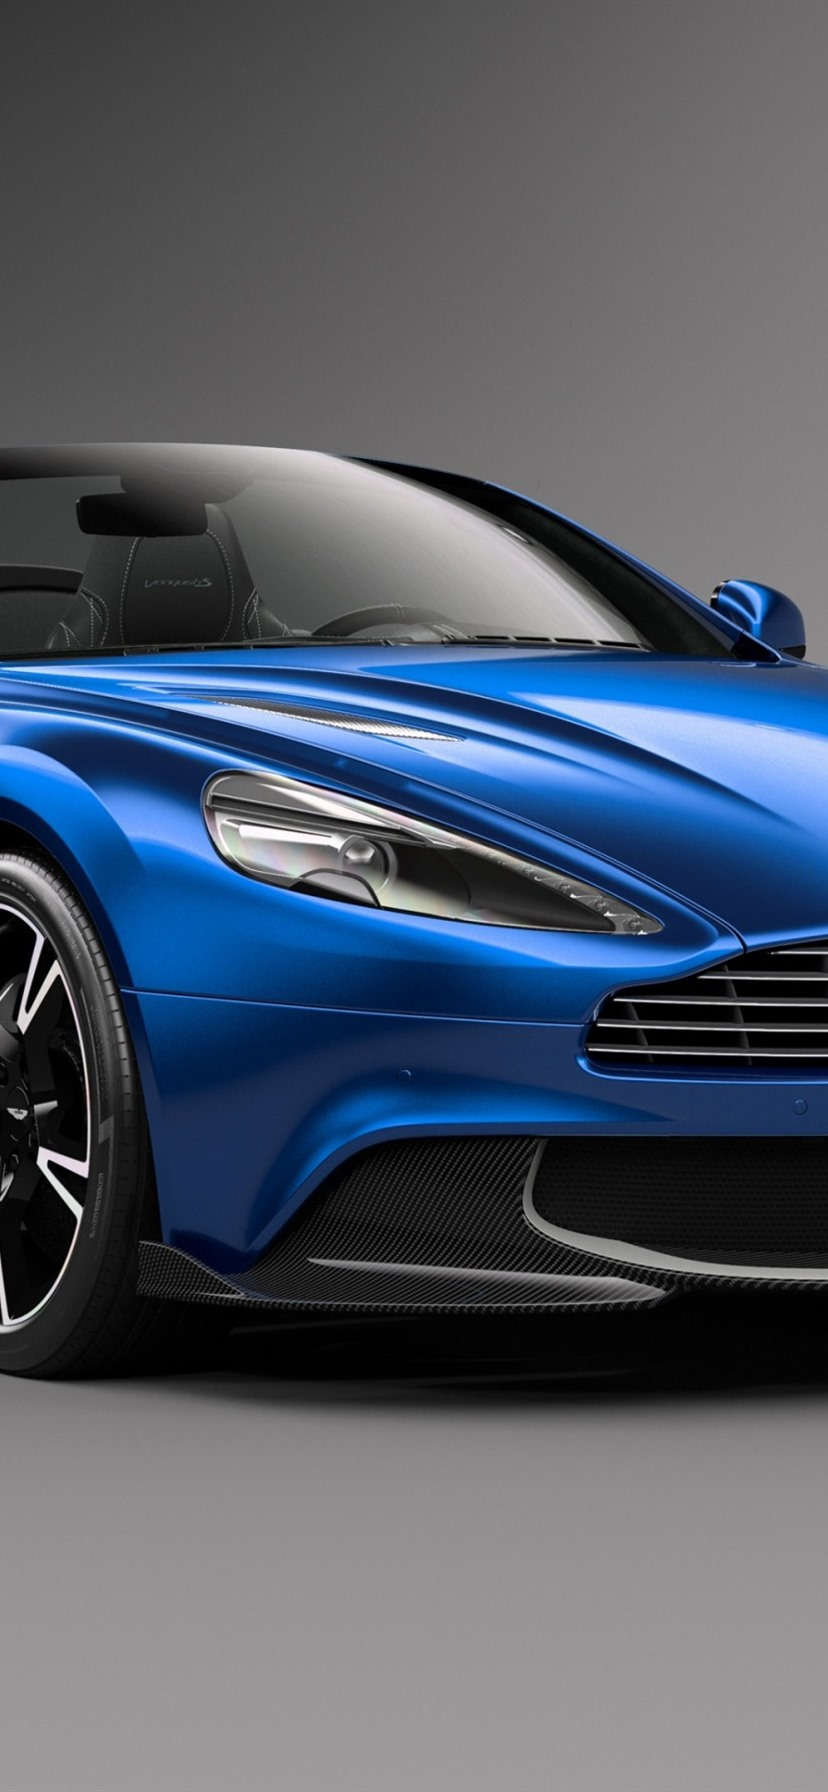 Iphone Wallpaper Aston Martin Vanquish S Blue Car Aston Martin Vanquish Volante S Convertible 828x1792 Download Hd Wallpaper Wallpapertip